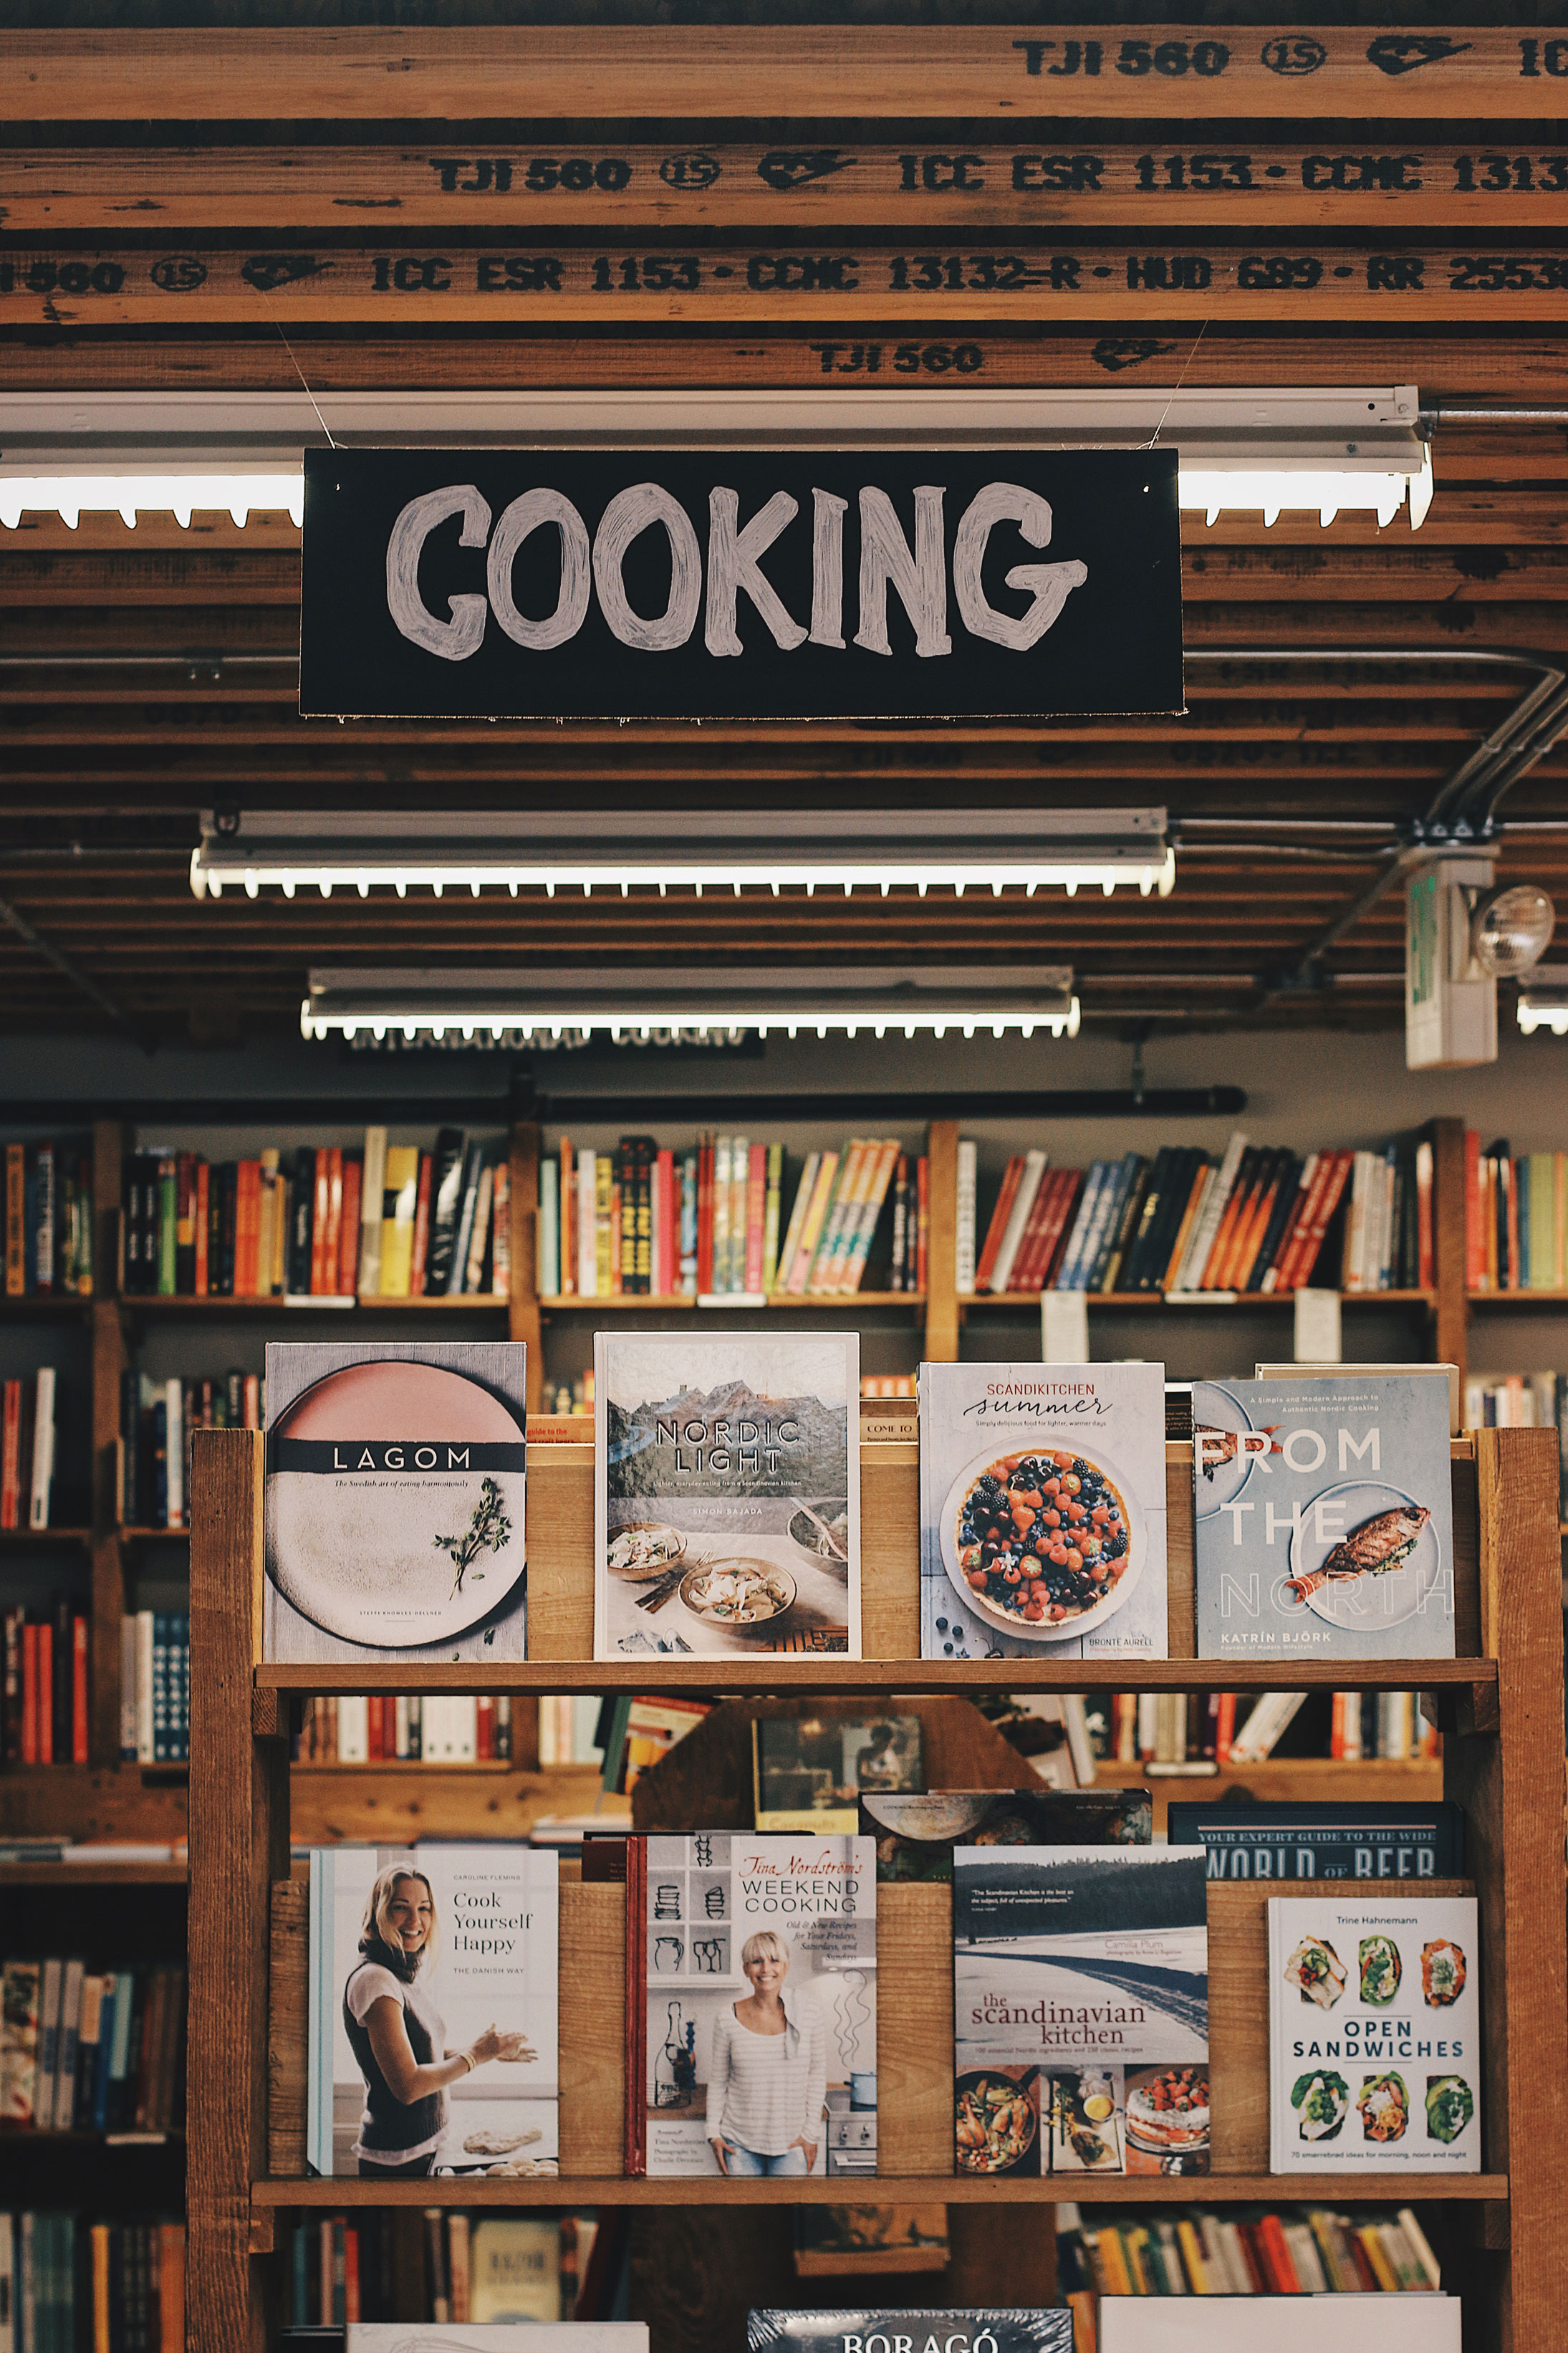 eliott-bay-bookstore-cooking-aisle